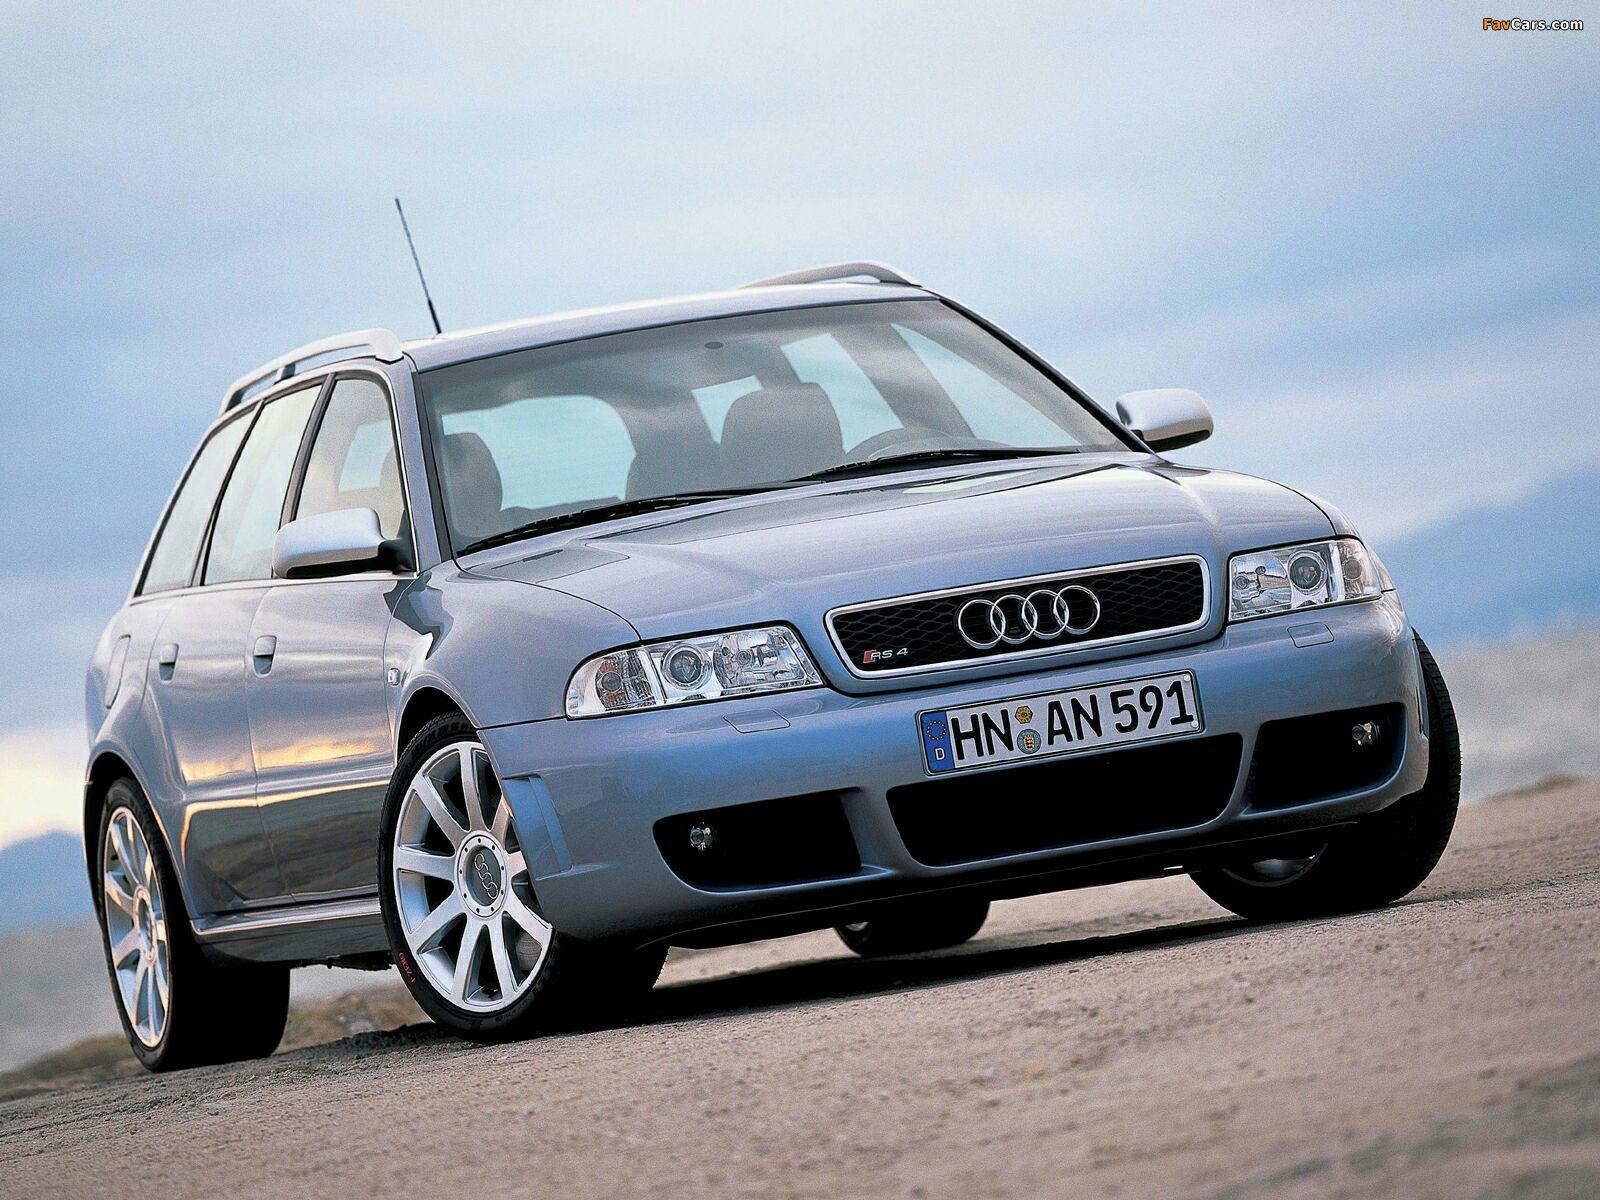 Audi RS4 (B5-8D)